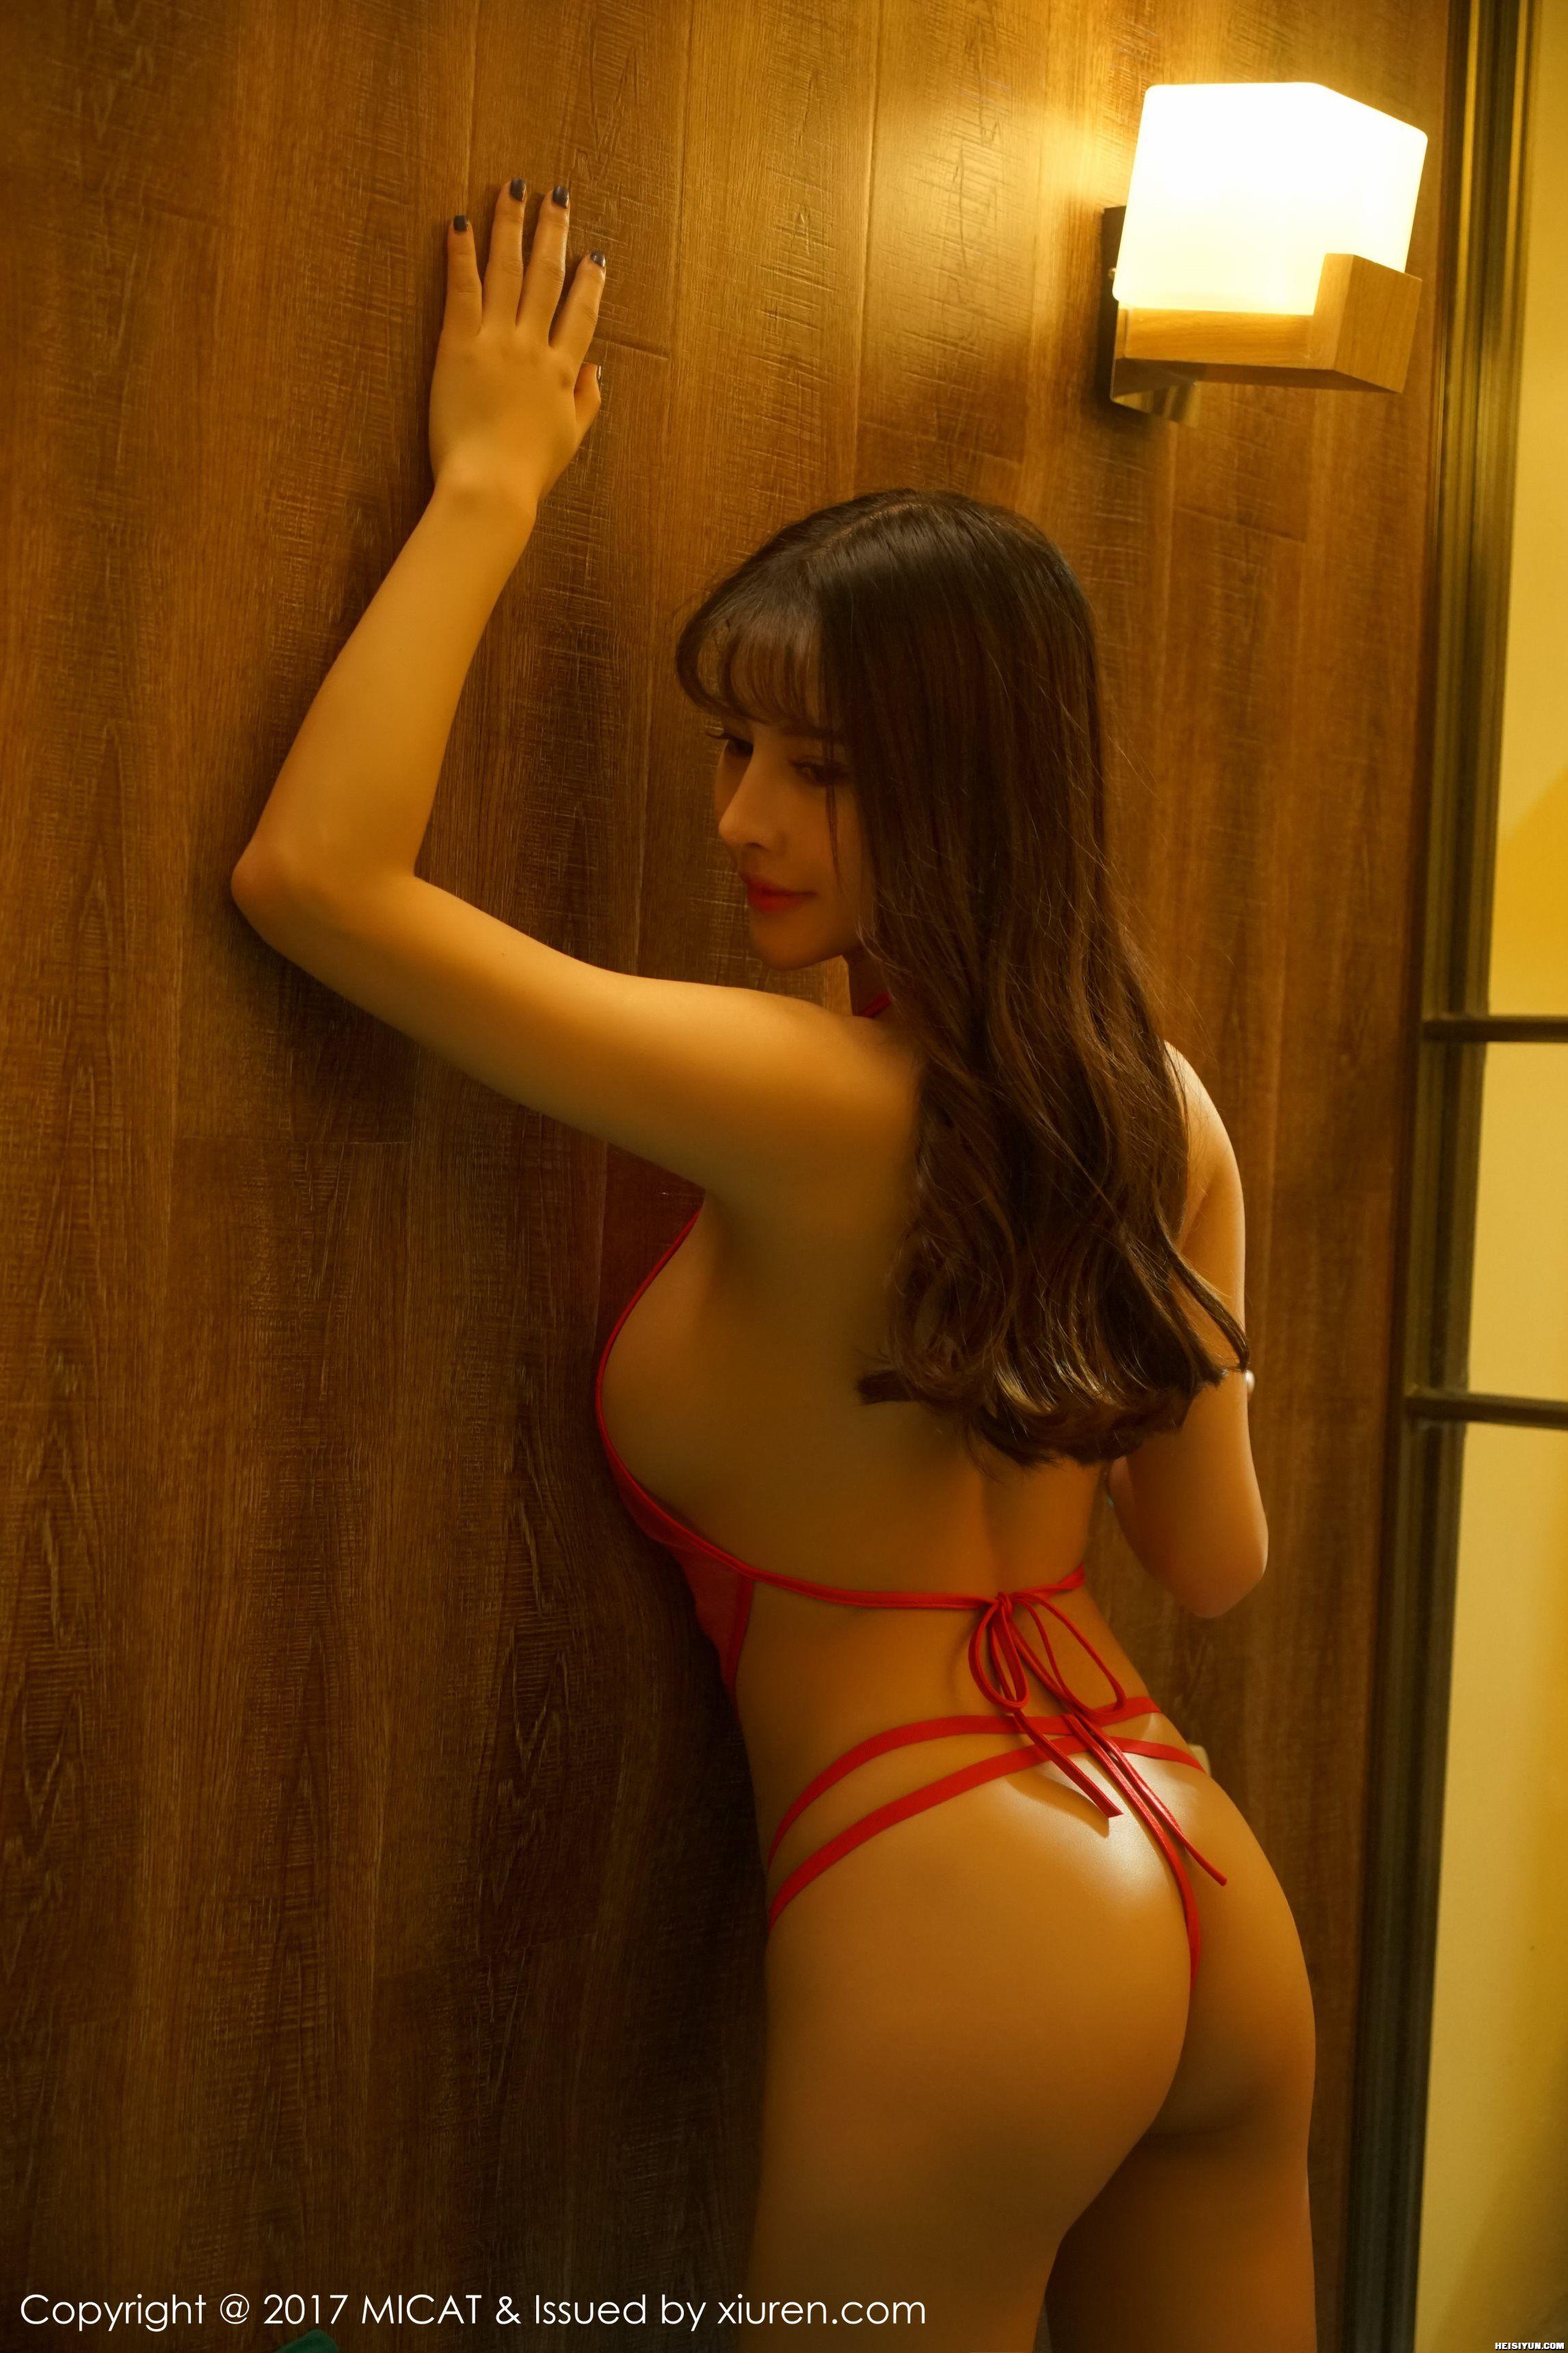 [MICAT猫萌榜] 2017.06.15 Vol.010 雪瑞Lisa [52+1P ]